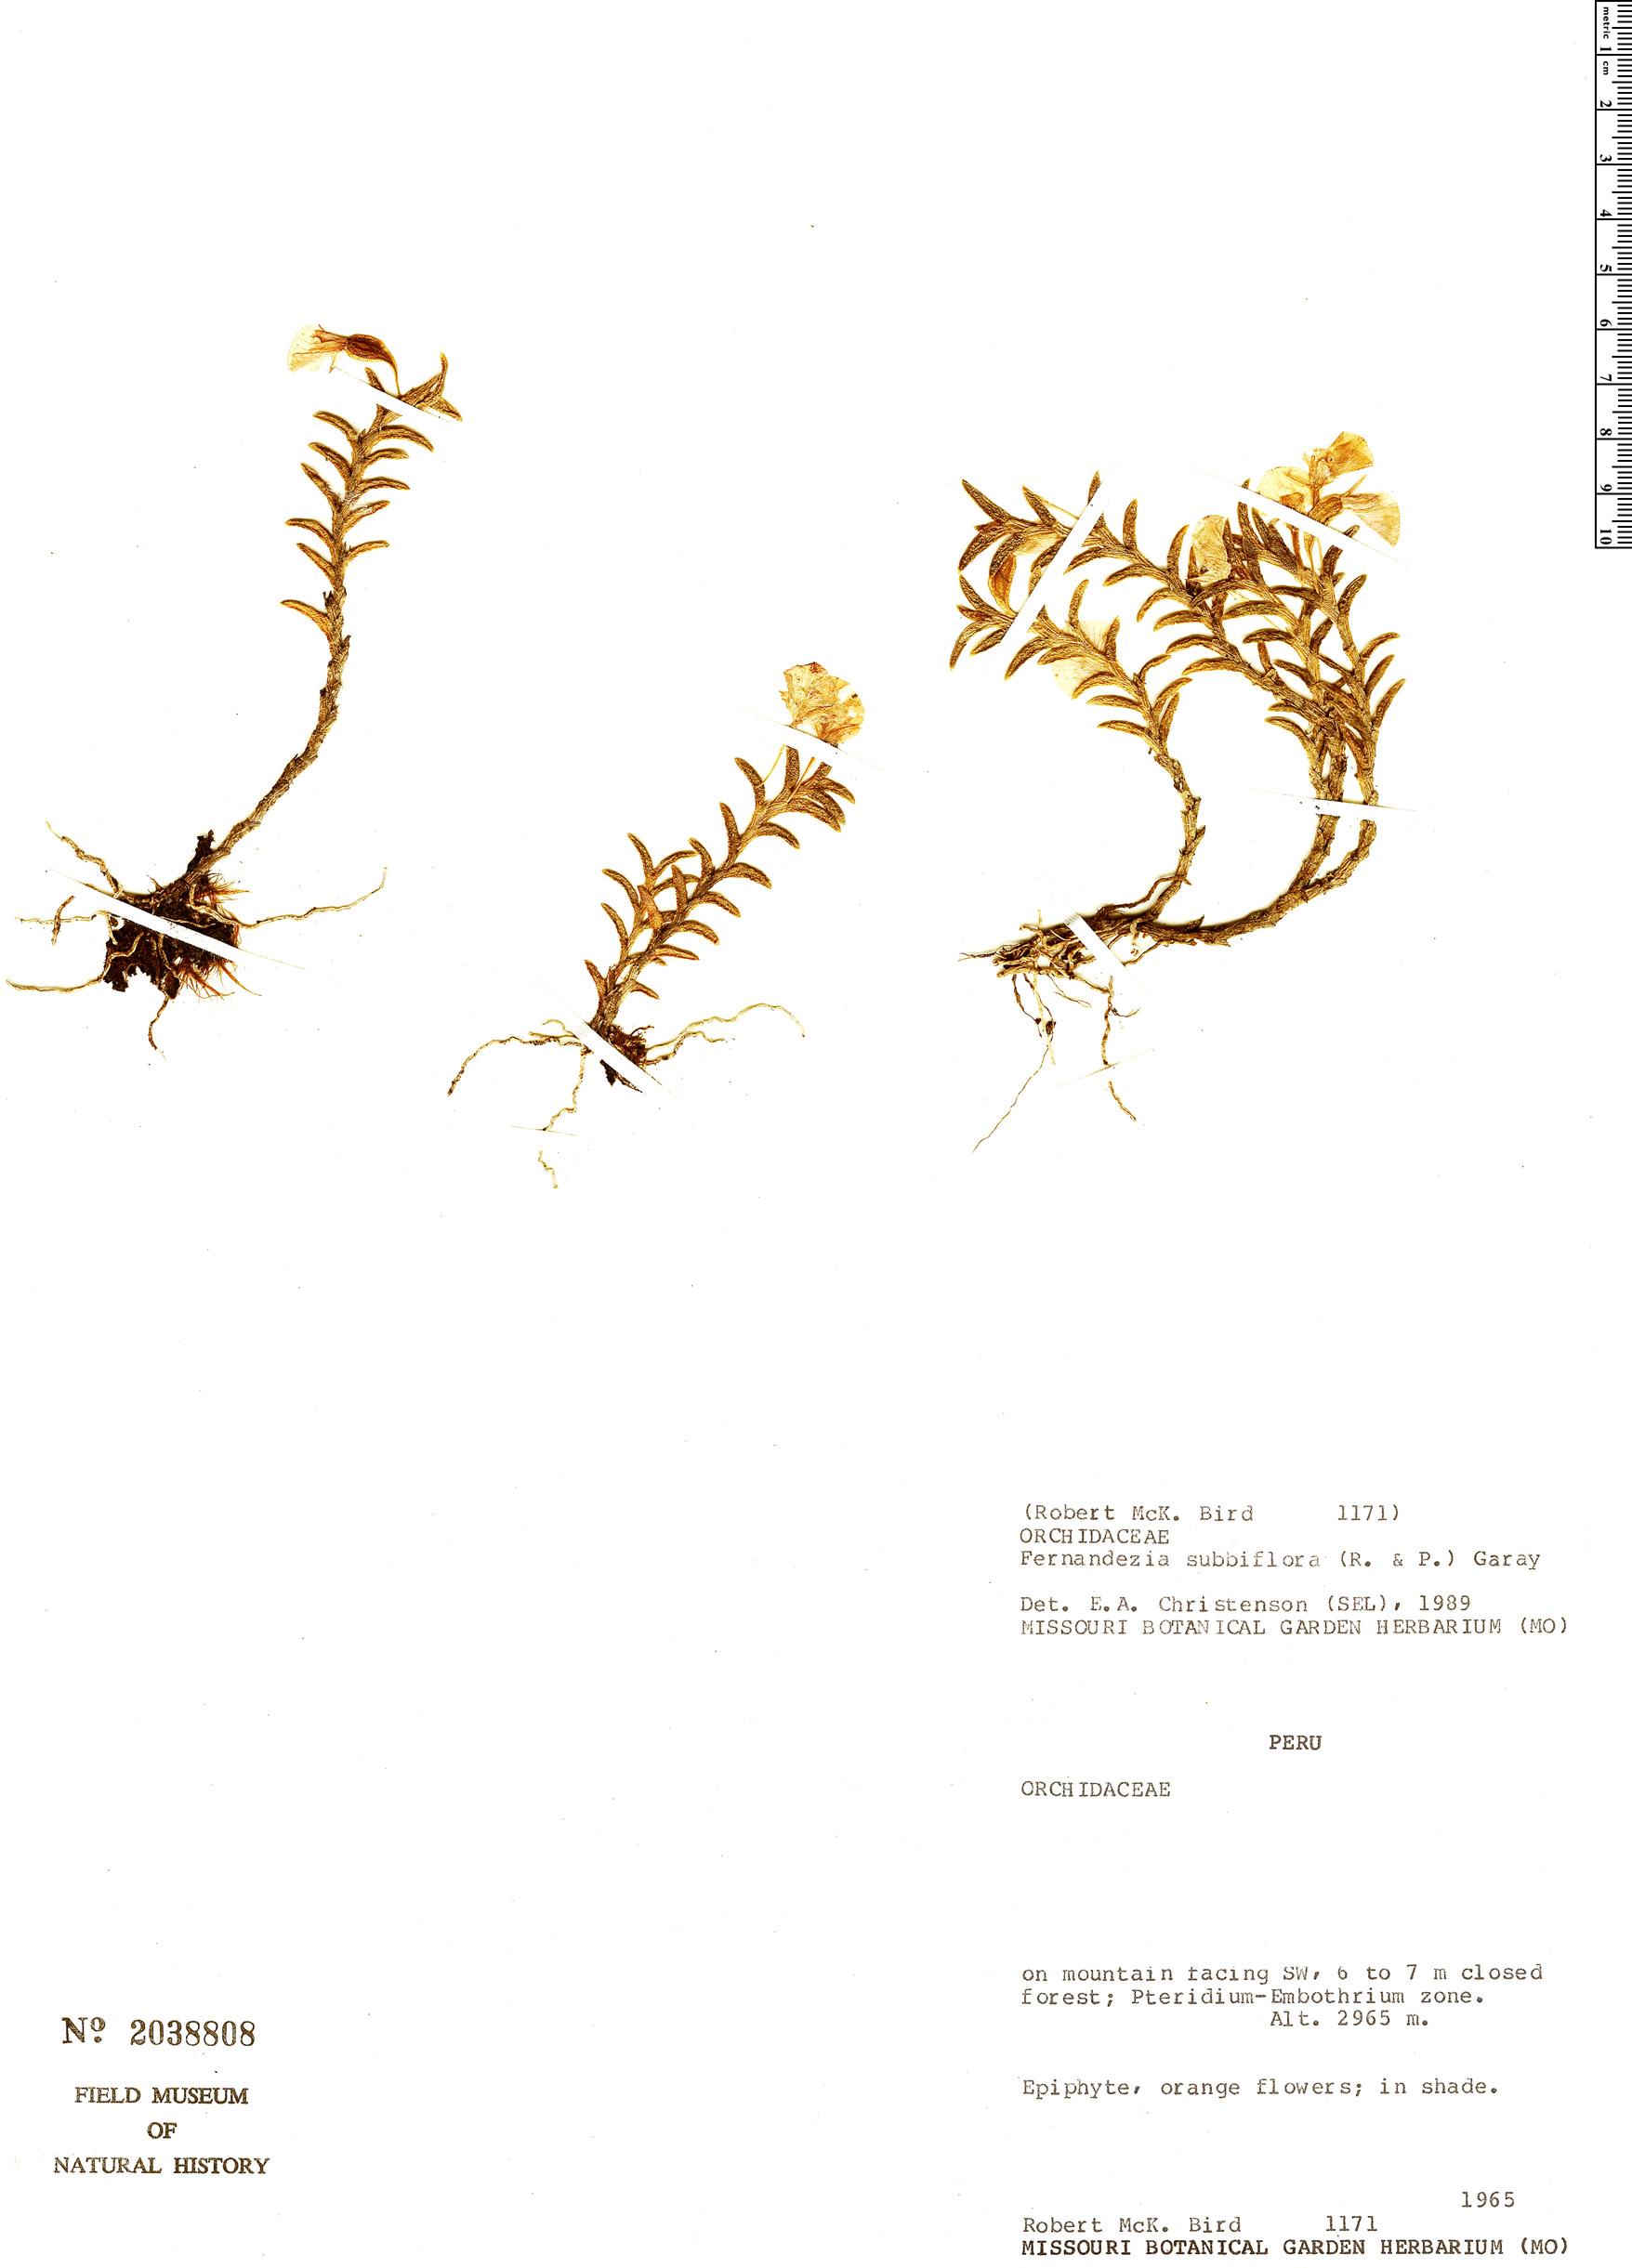 Specimen: Fernandezia subbiflora